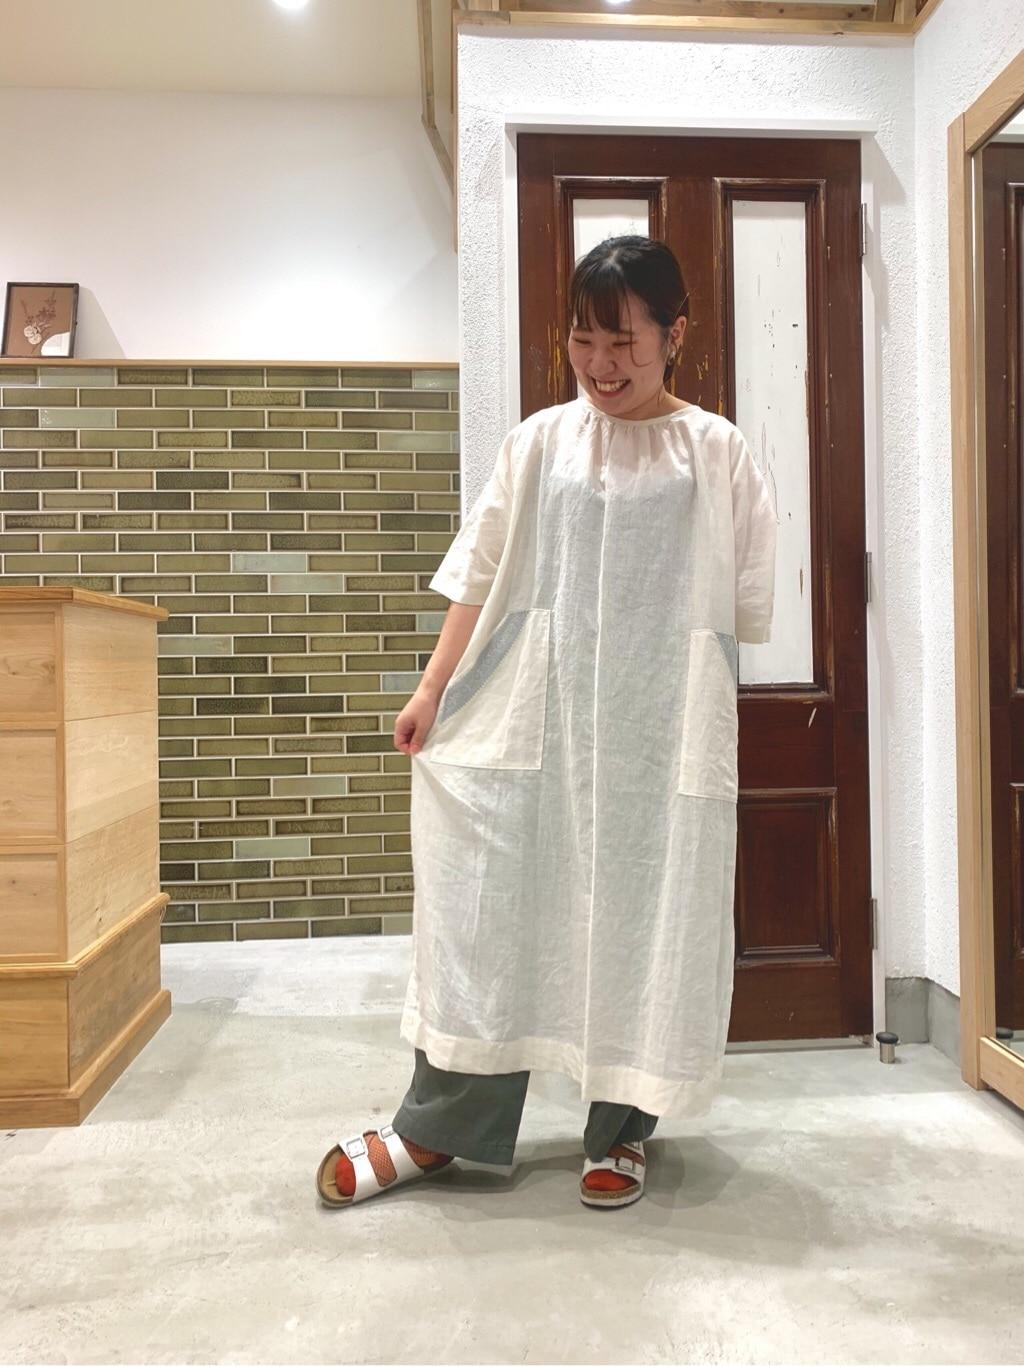 chambre de charme 横浜ジョイナス 身長:155cm 2020.08.19